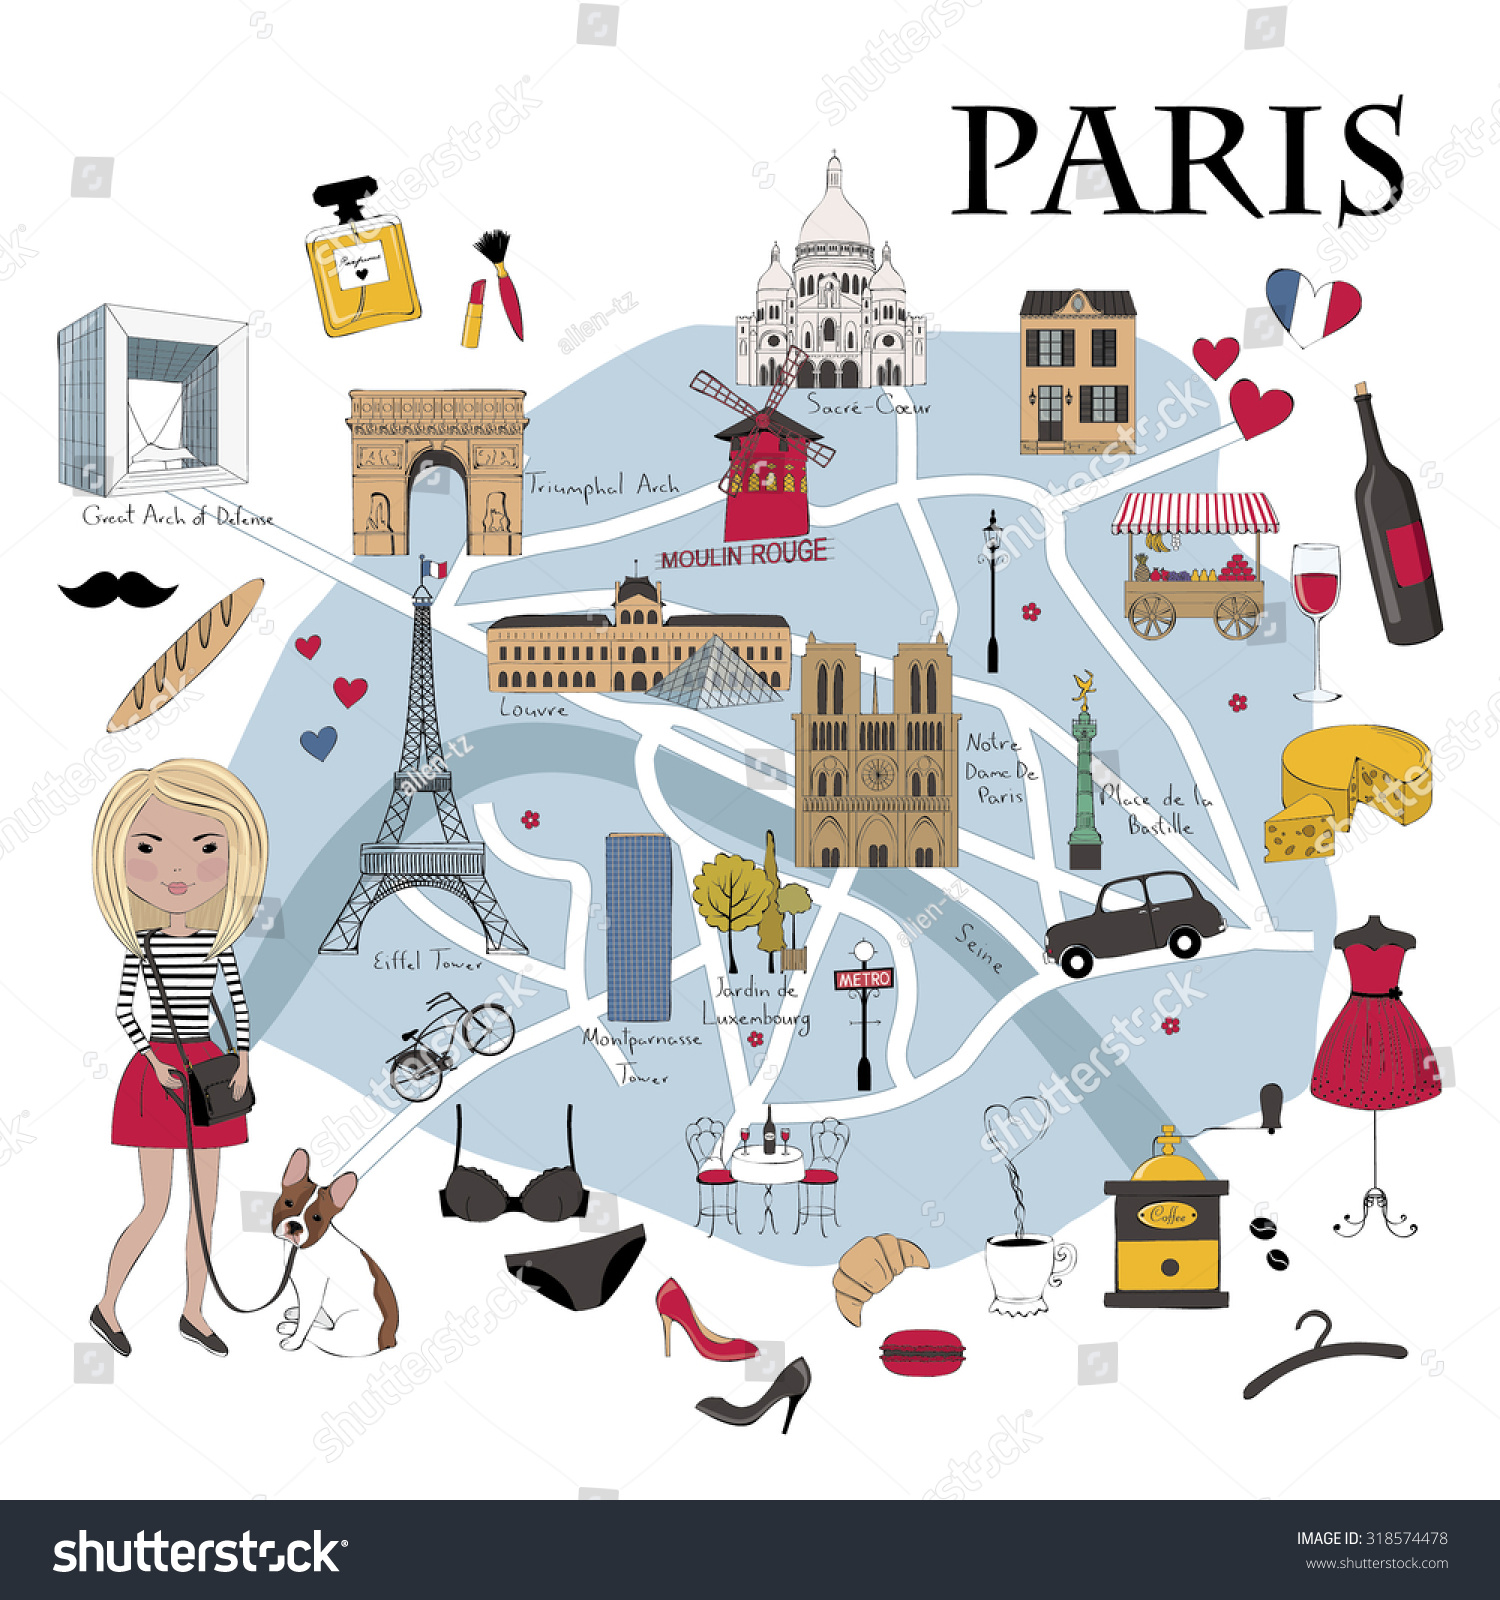 paris map with famous landmarks